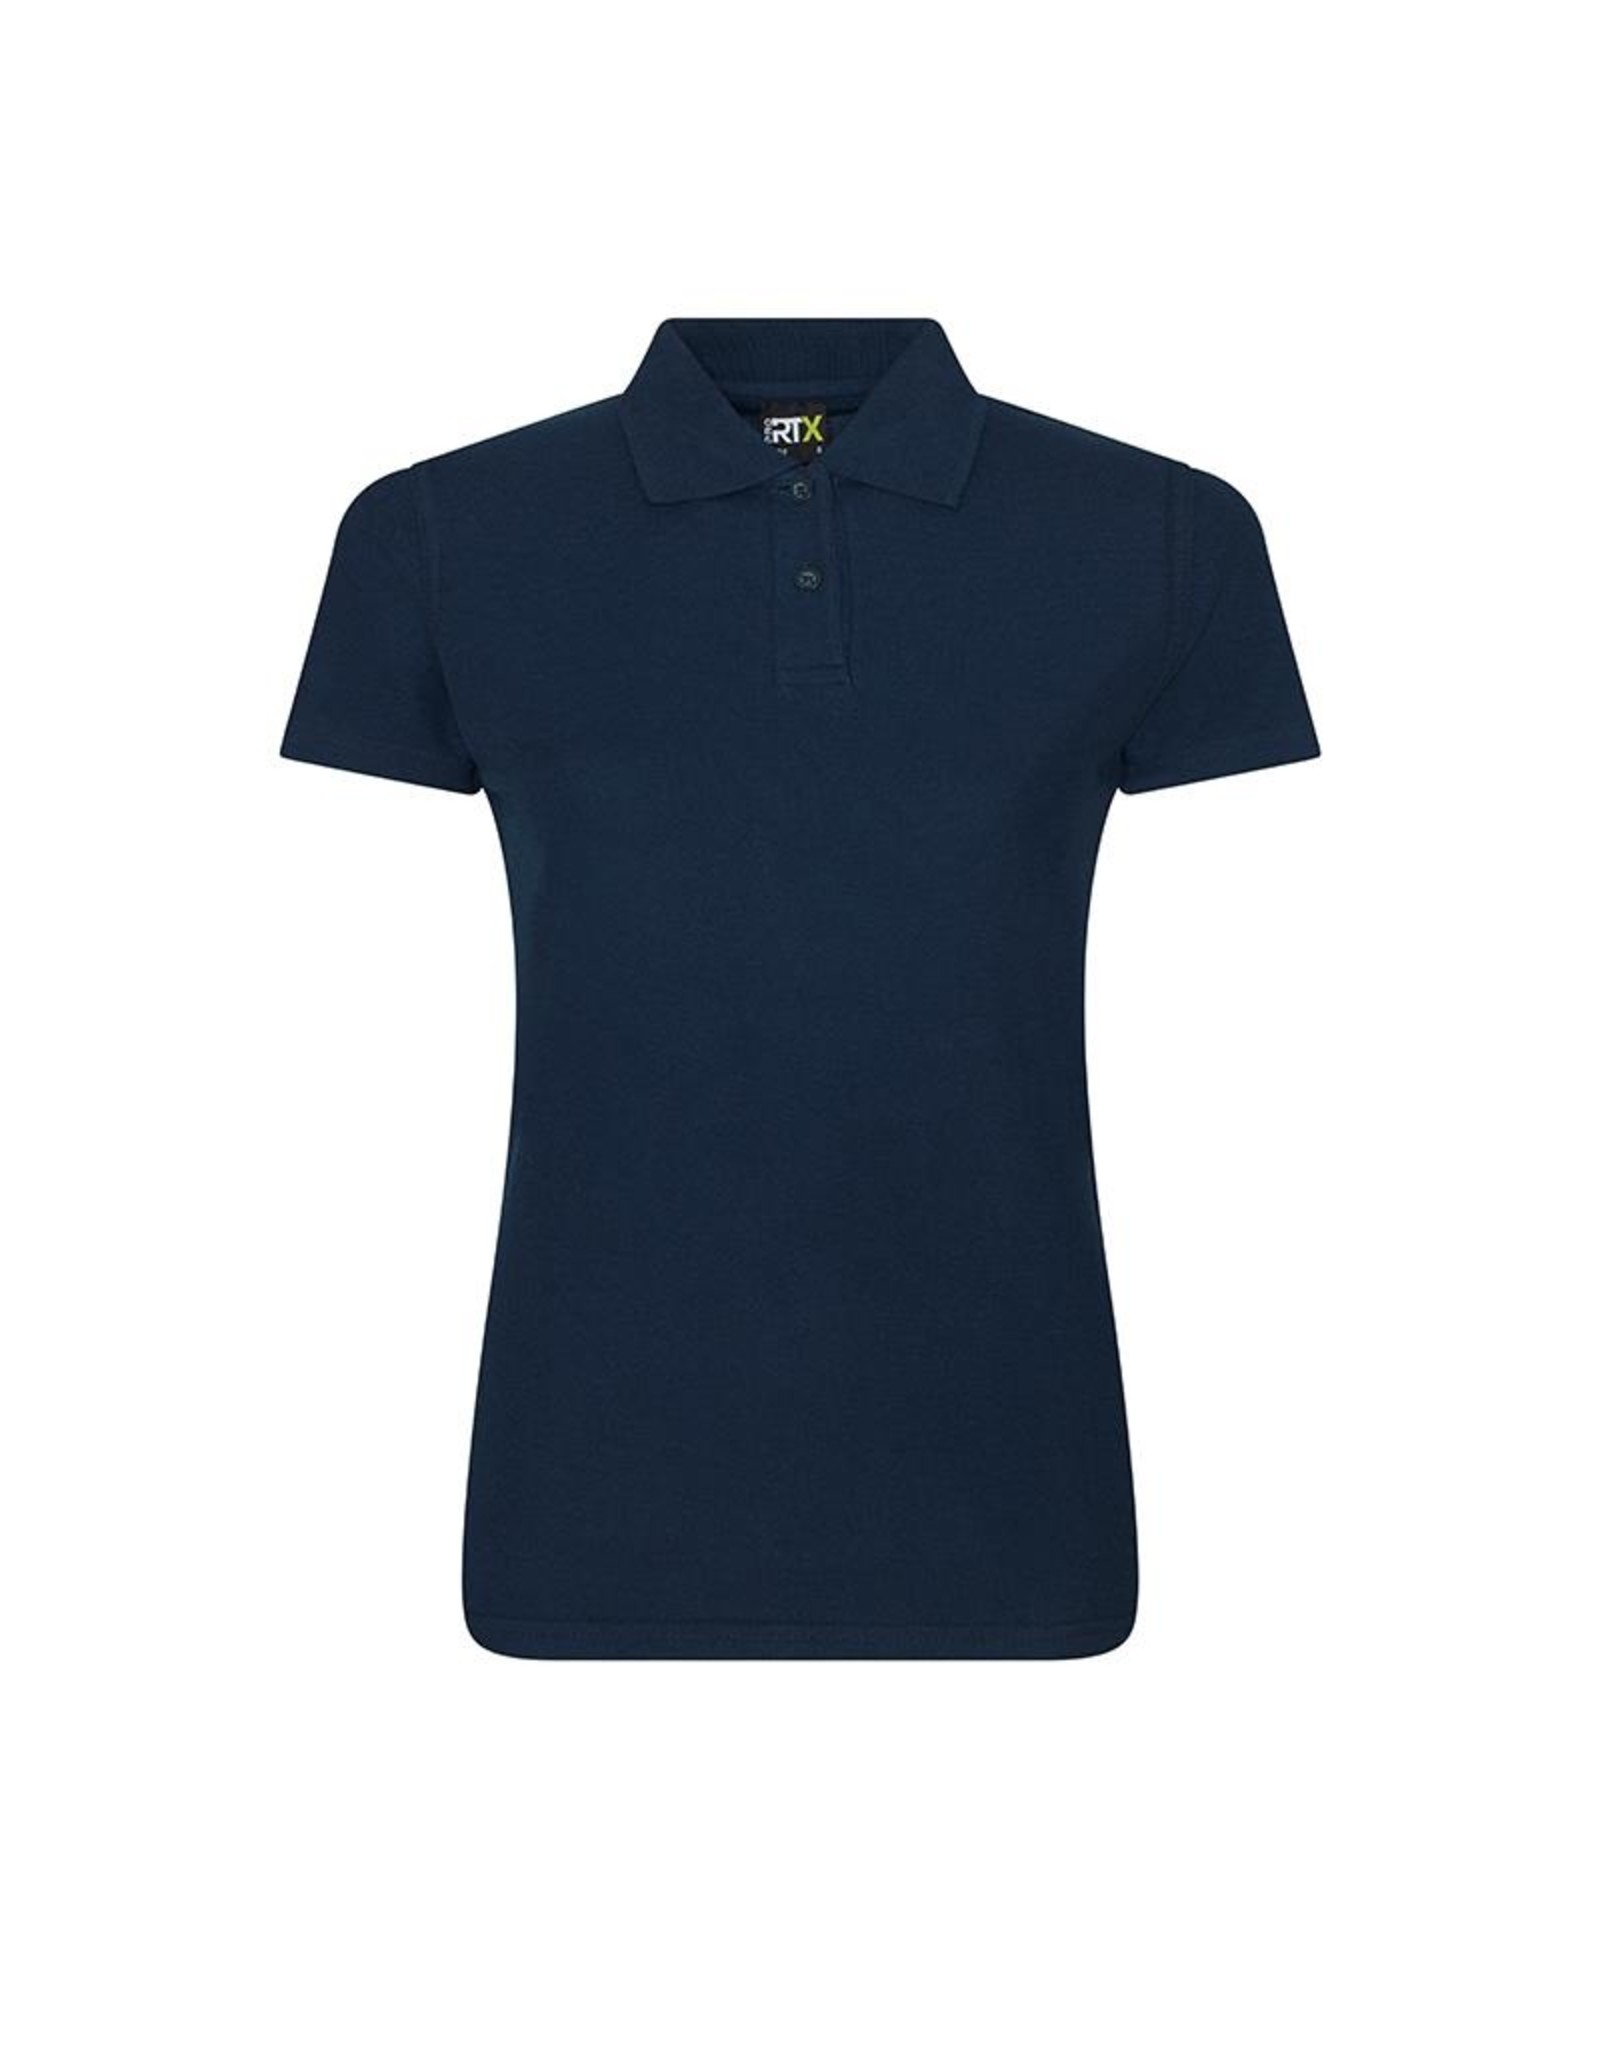 Pro RTX Dames POLOSHIRT piqué workwear navy